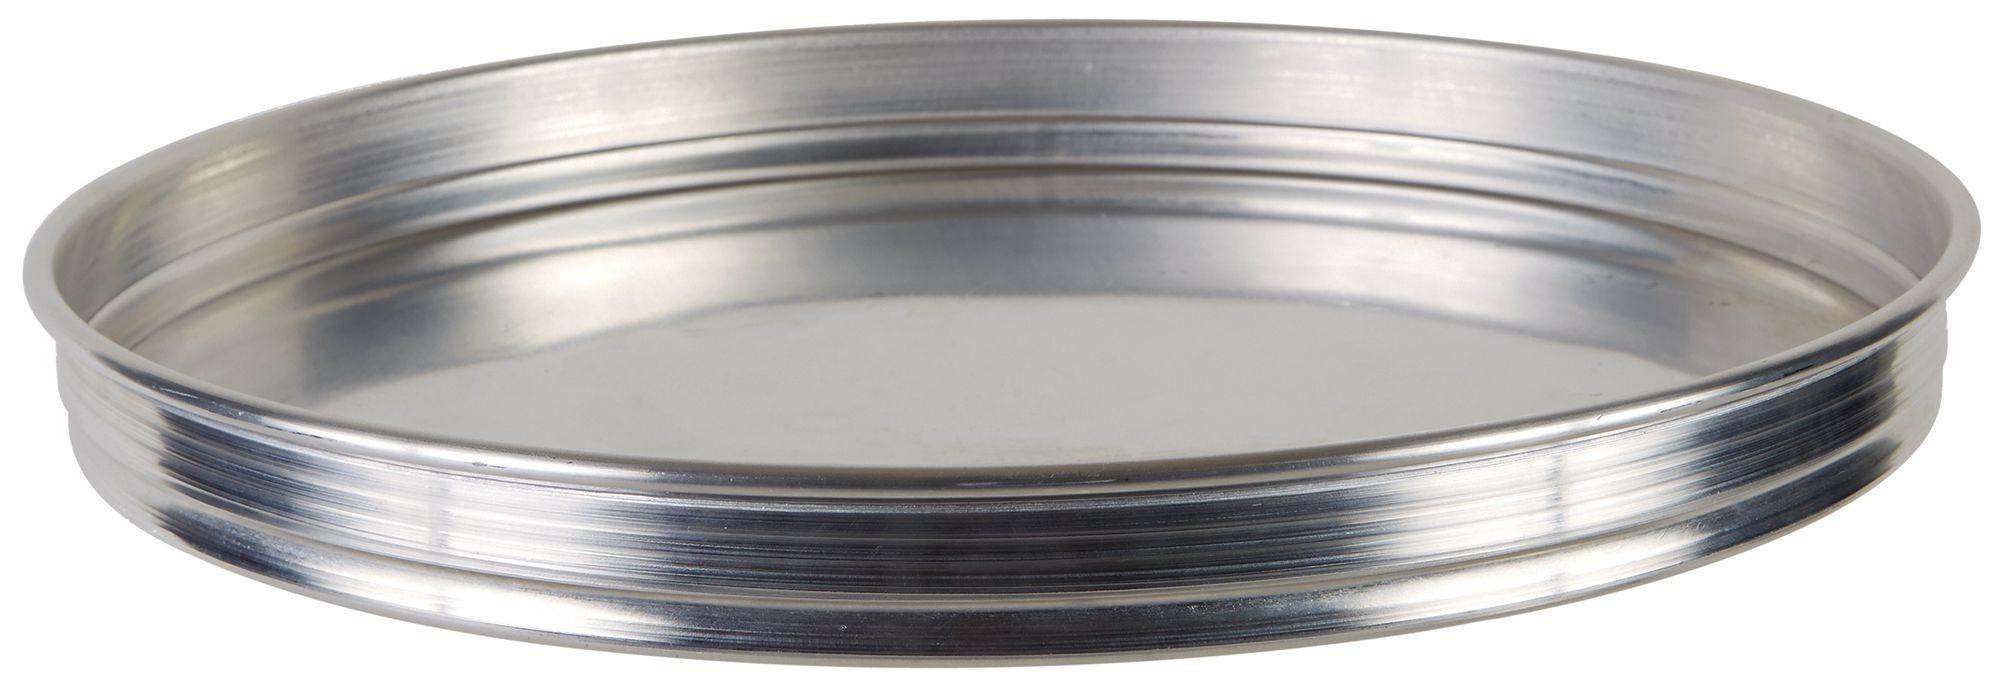 "Winco APZK-1615 16"" x 1-1/2"" Stackable Aluminum Pizza Pan"